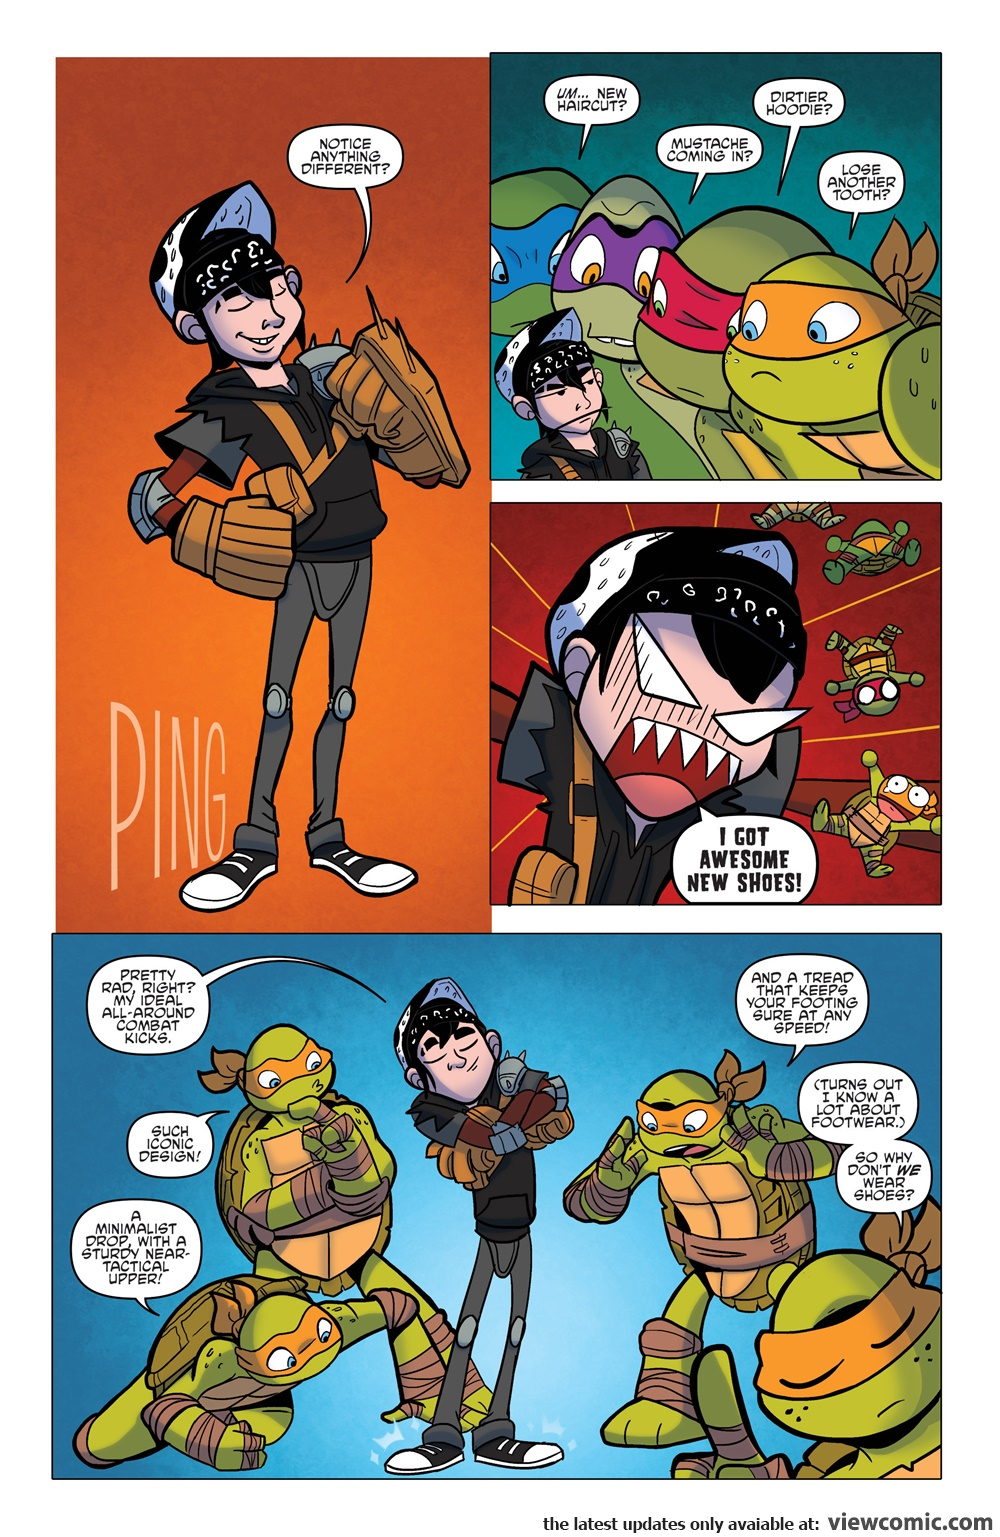 Pin By Shelby On Tmnt W Teenage Mutant Ninja Turtles Ultimate Spiderman Batman The Long Halloween